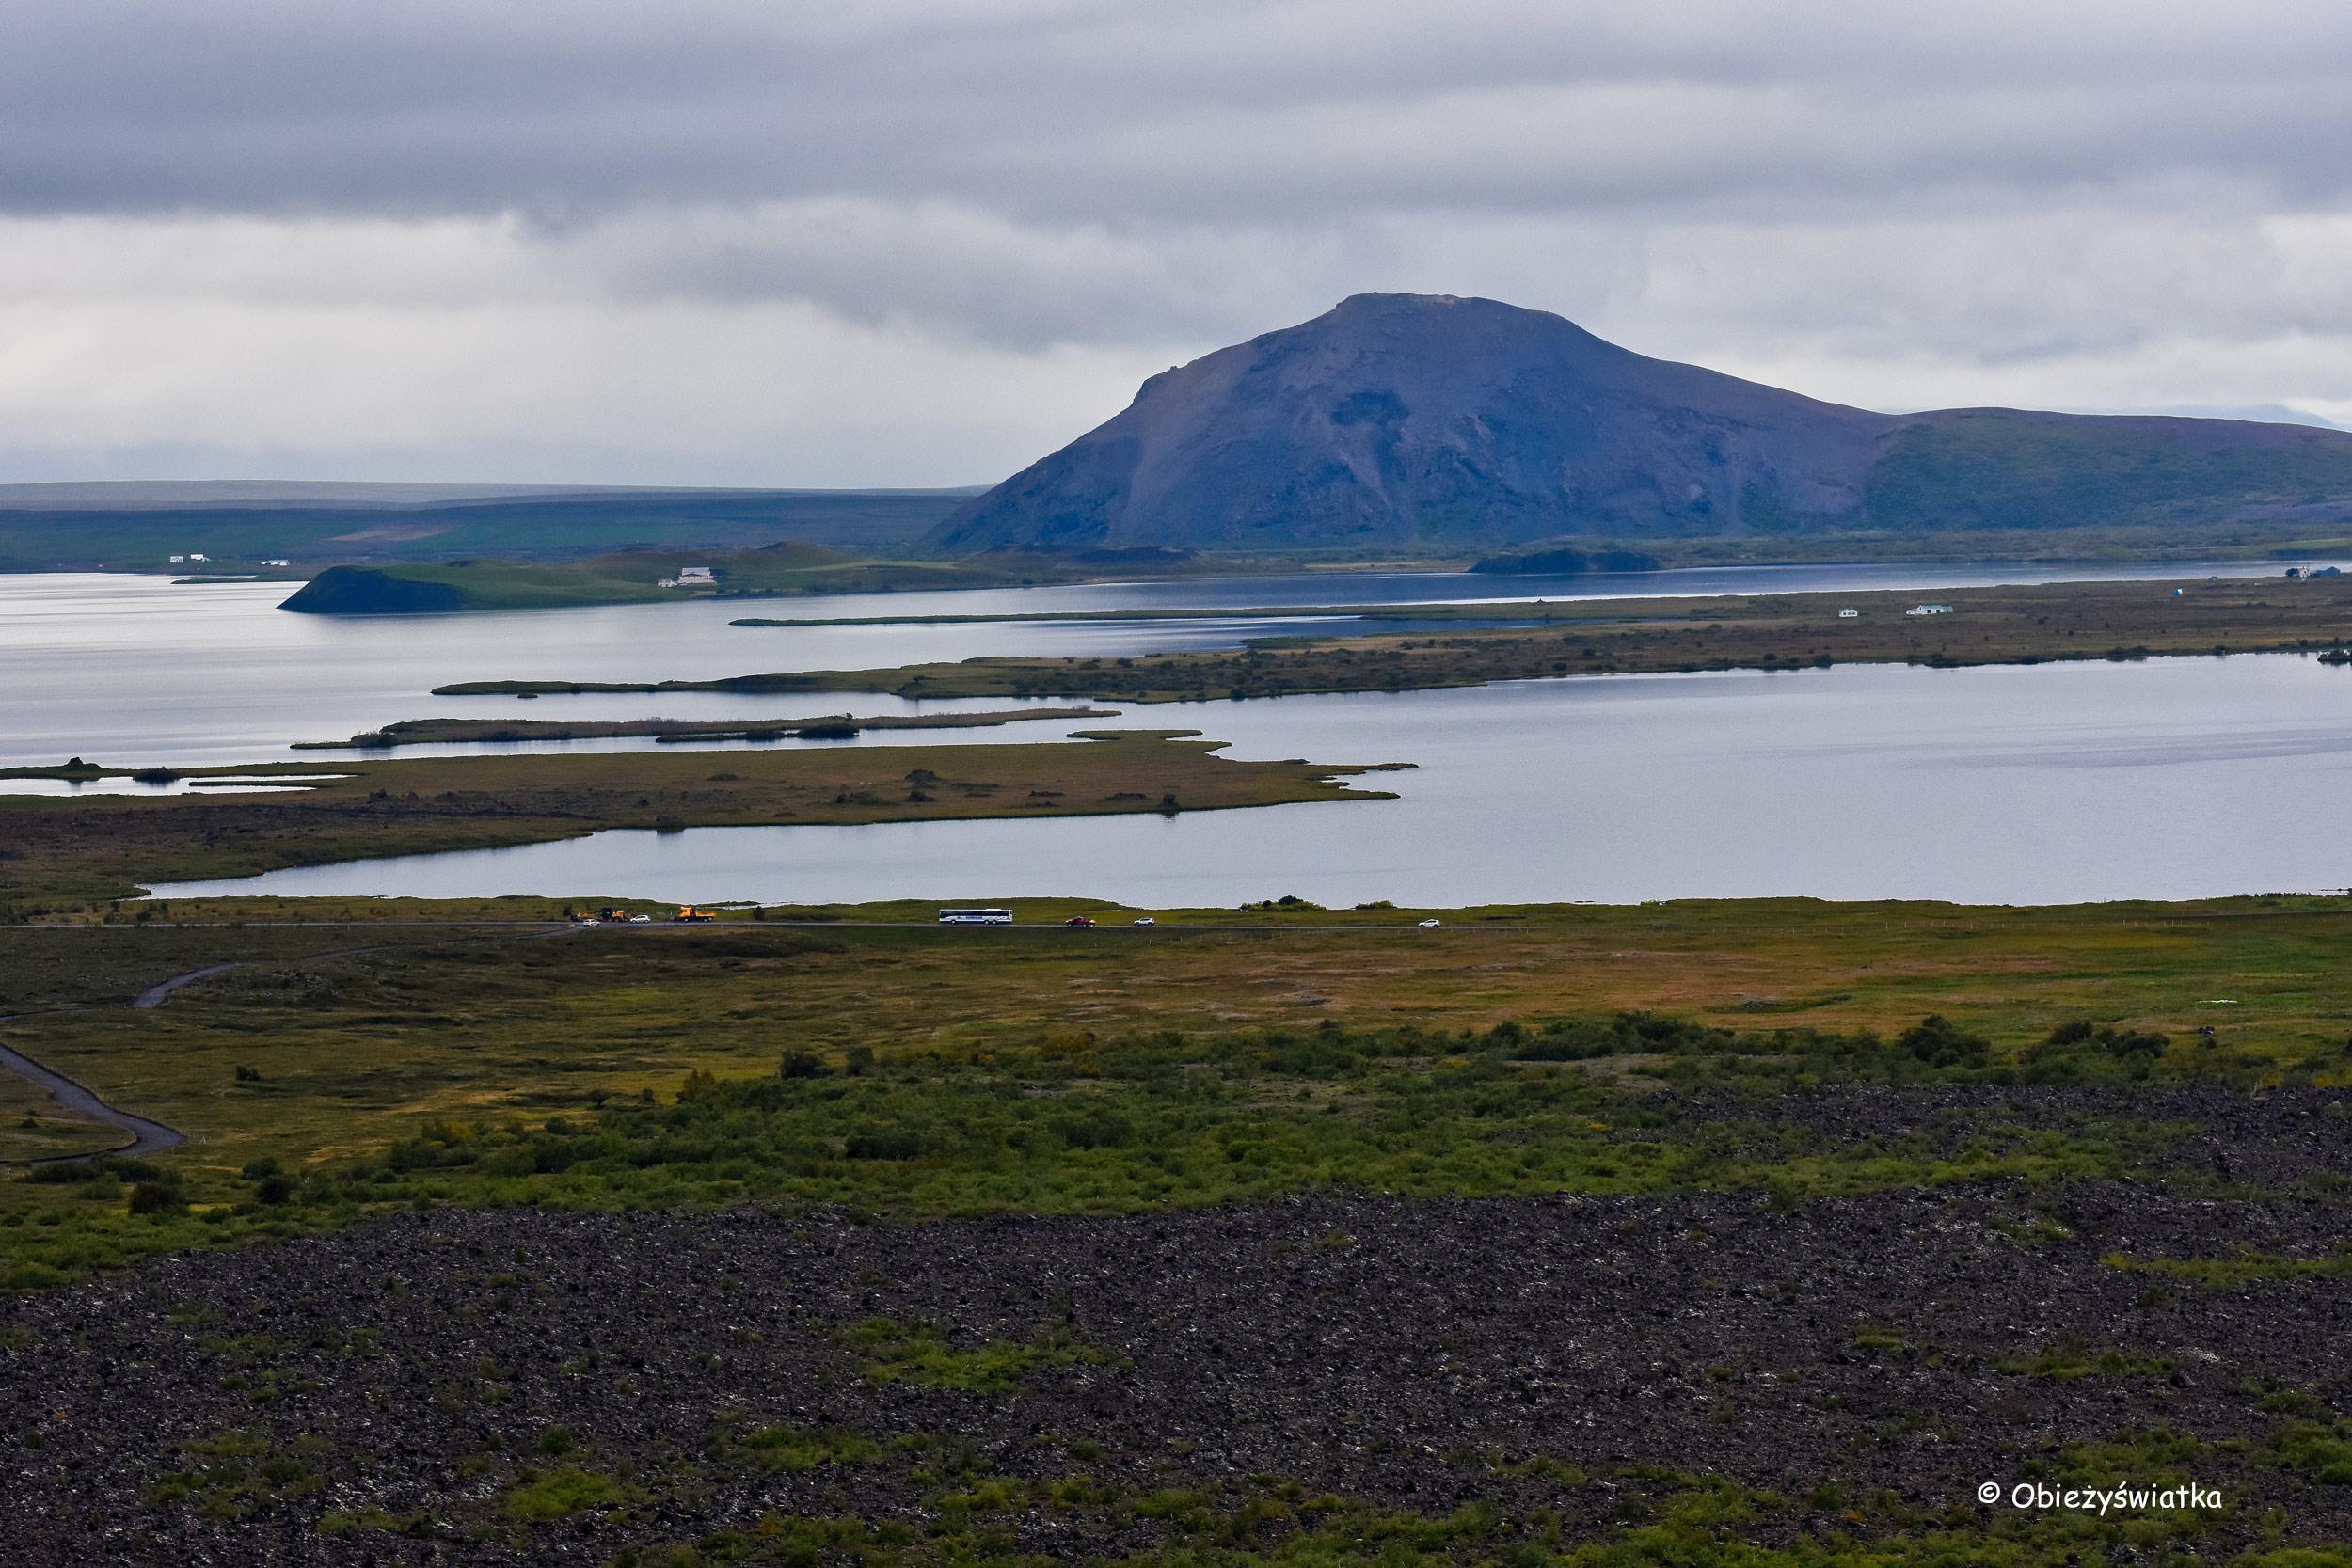 Jezioro Myvatn, widok z wulkanu Hverfjall, Islandia